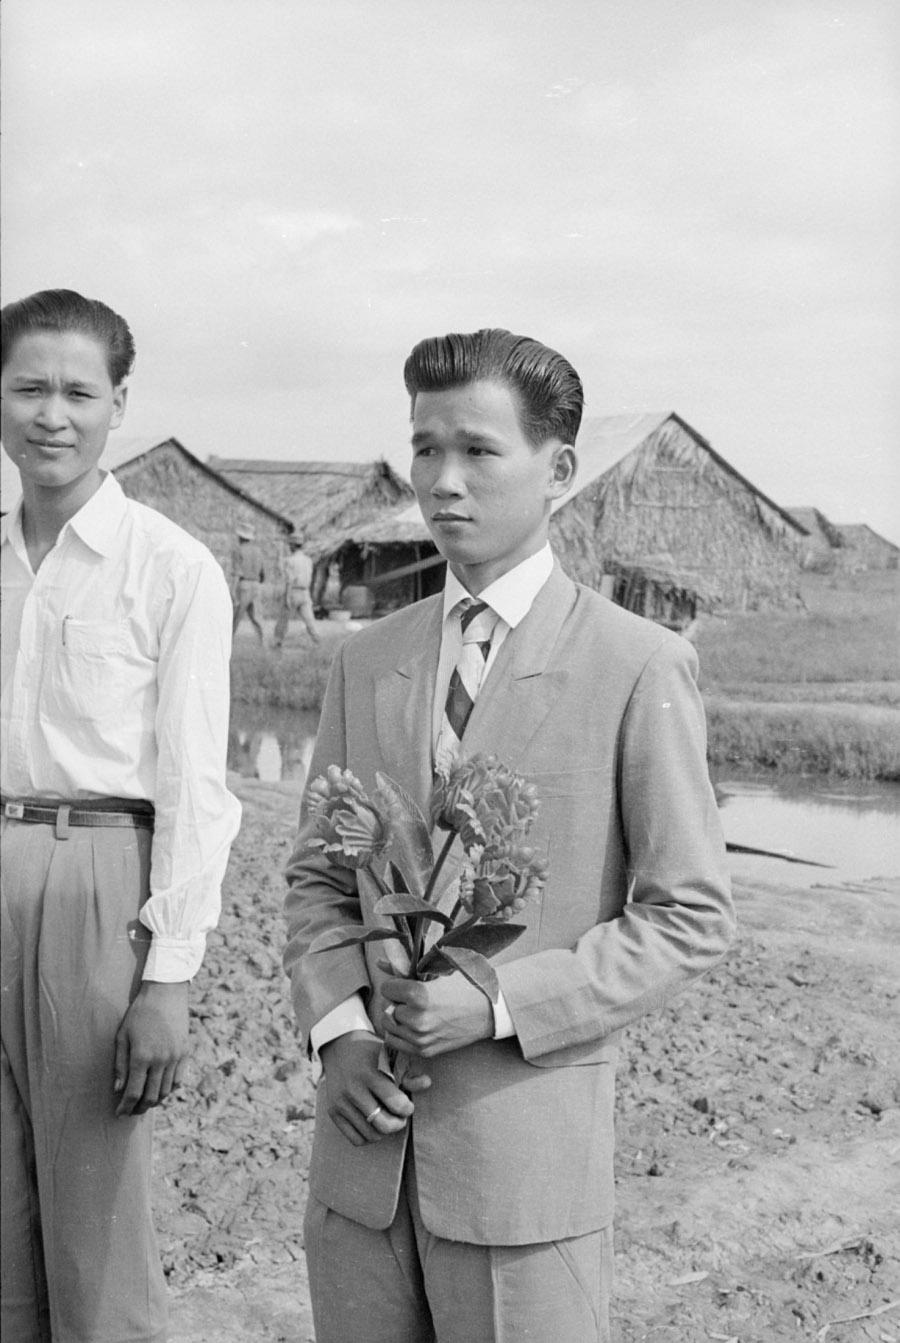 arvn_squad_leader_on_his_wedding_day_binh_hung_1961.jpg